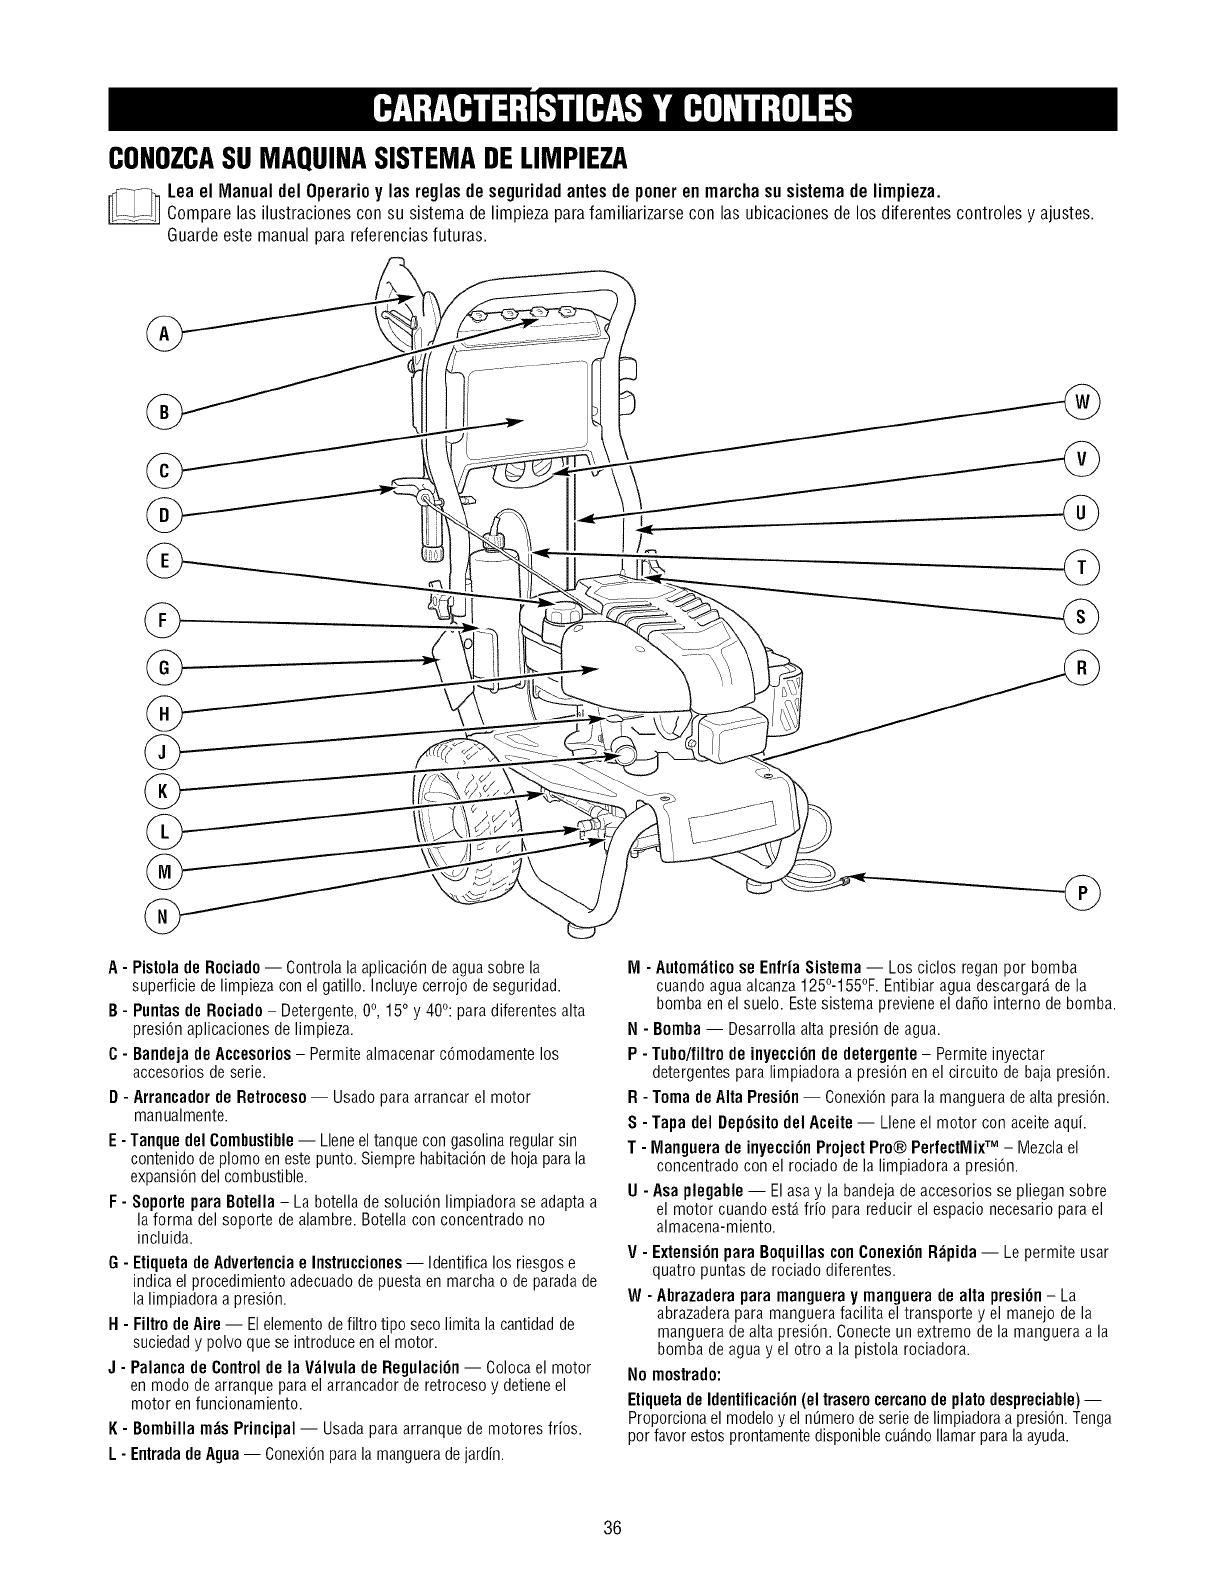 Craftsman 580752620 User Manual Pressure Washer Manuals And Guides 36si Wiring Diagram Conozcasu Maquinasistemadelimpieza Leael